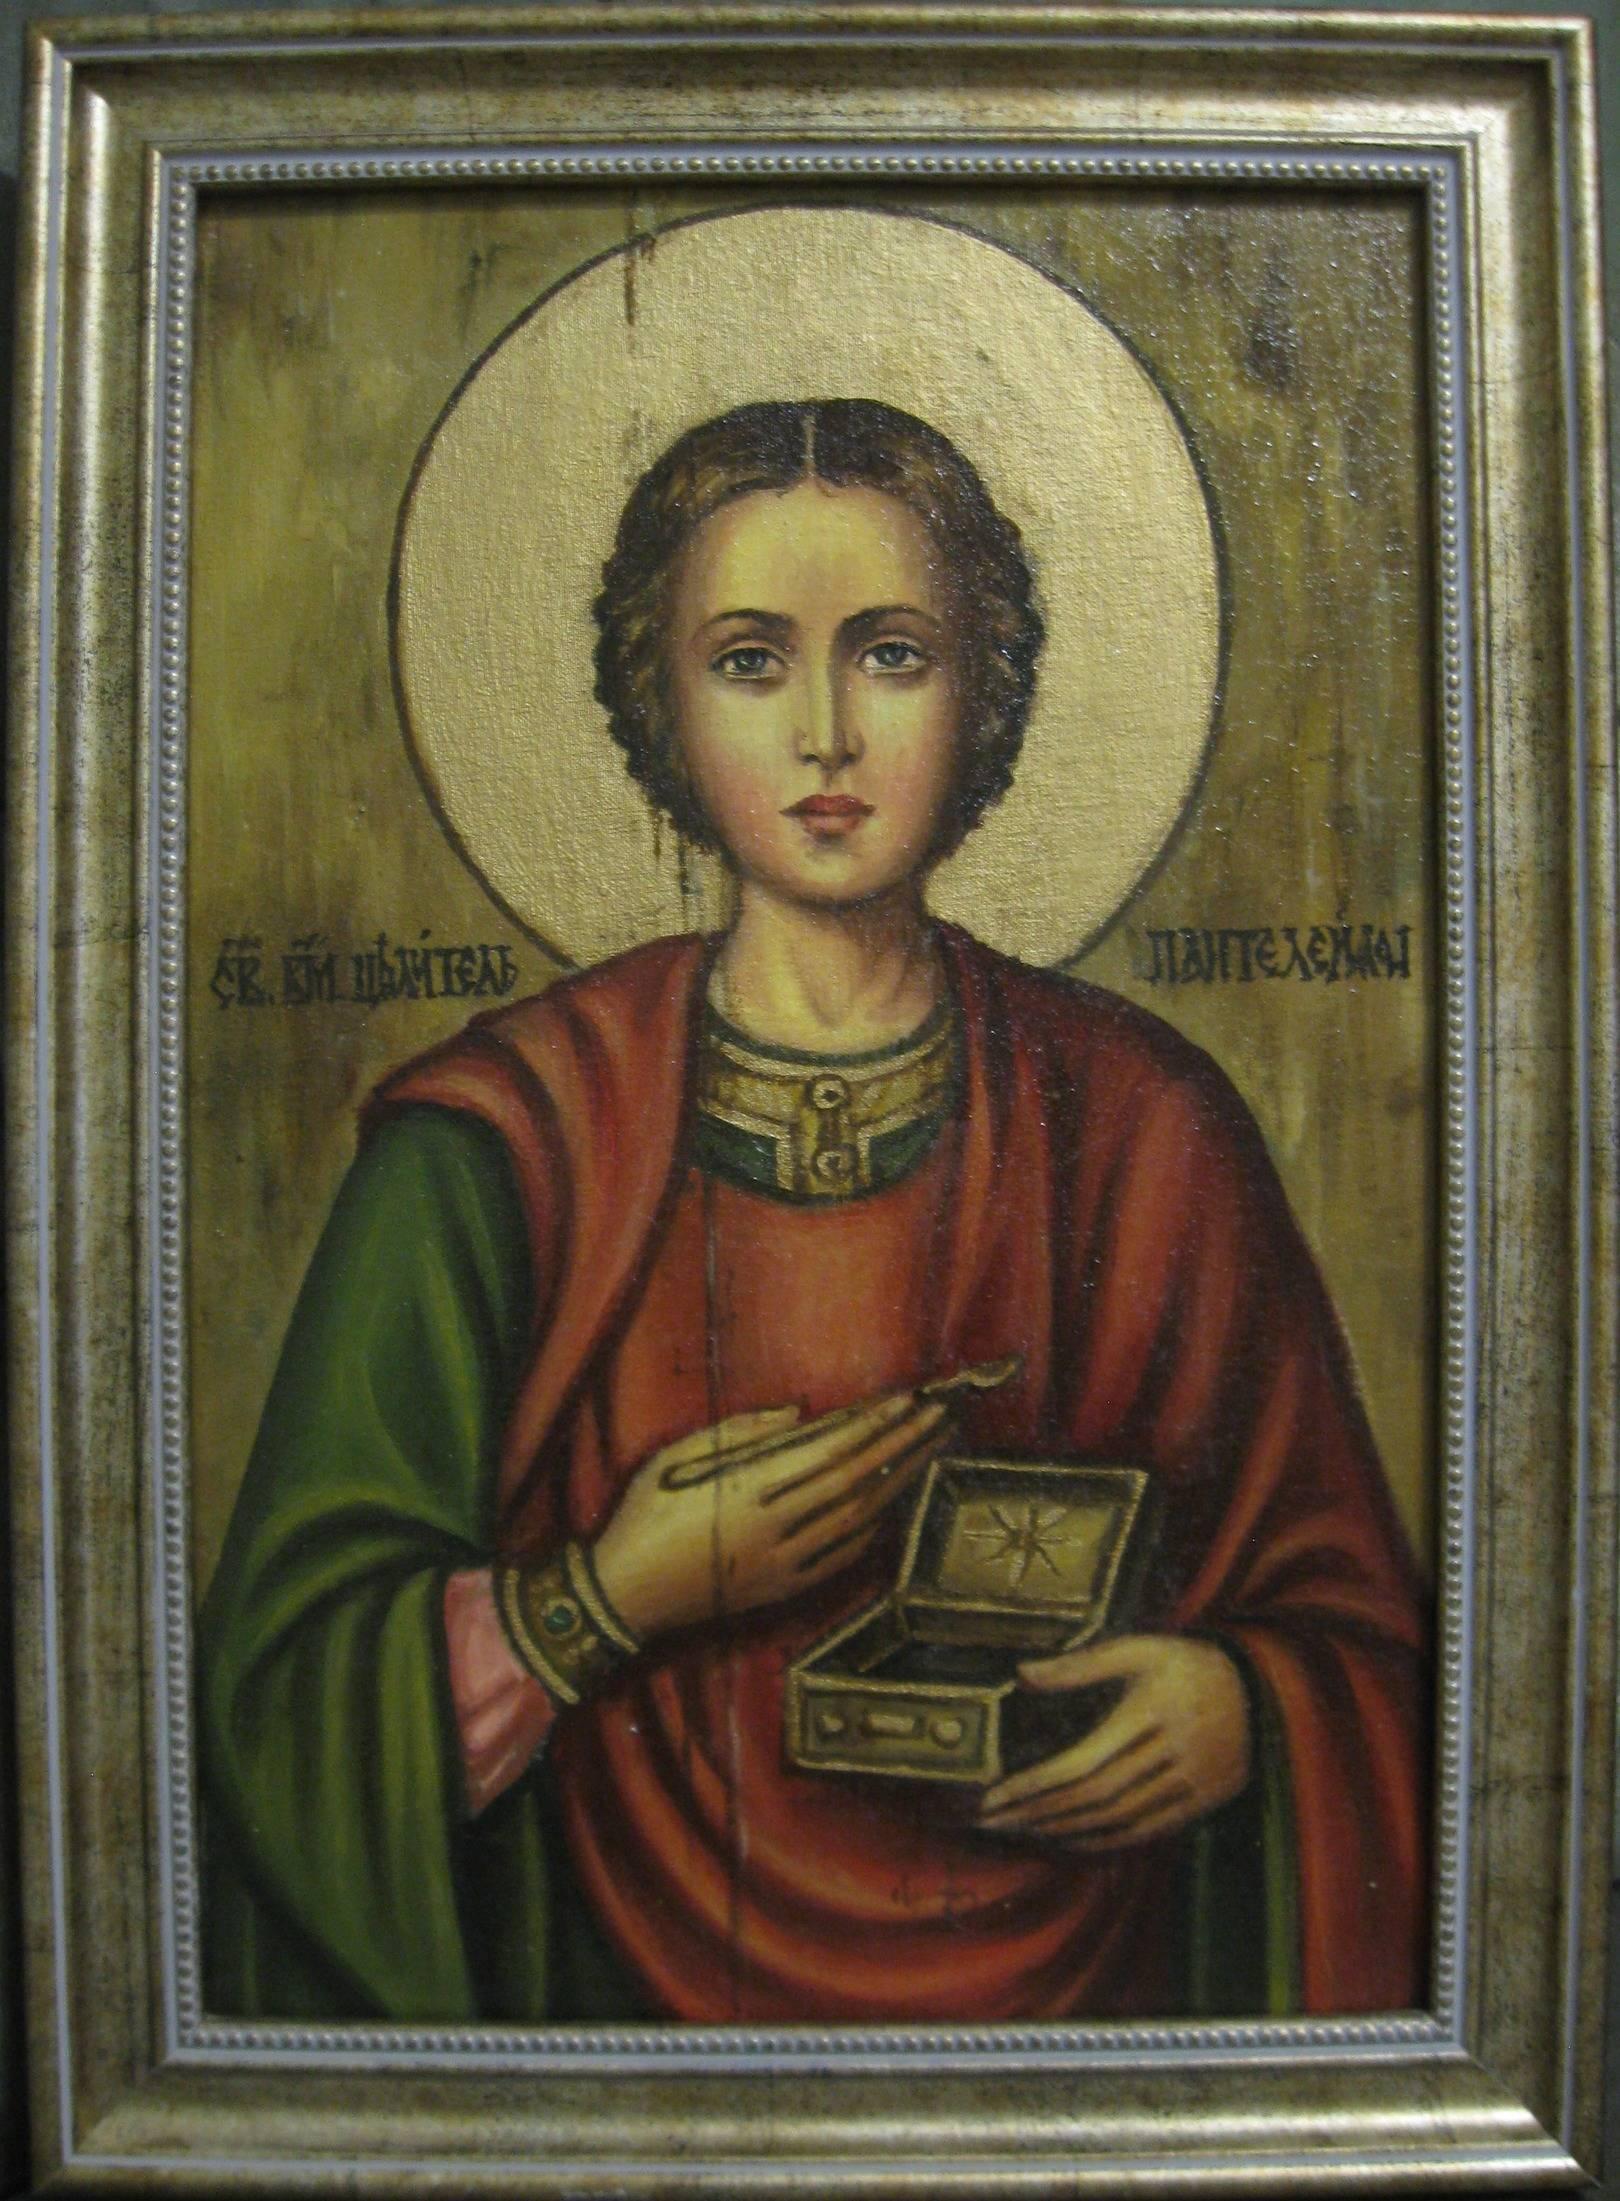 Святой Пантелеймон (холст,масло,лак-патина,кракелюр,Ядвига Сенько)